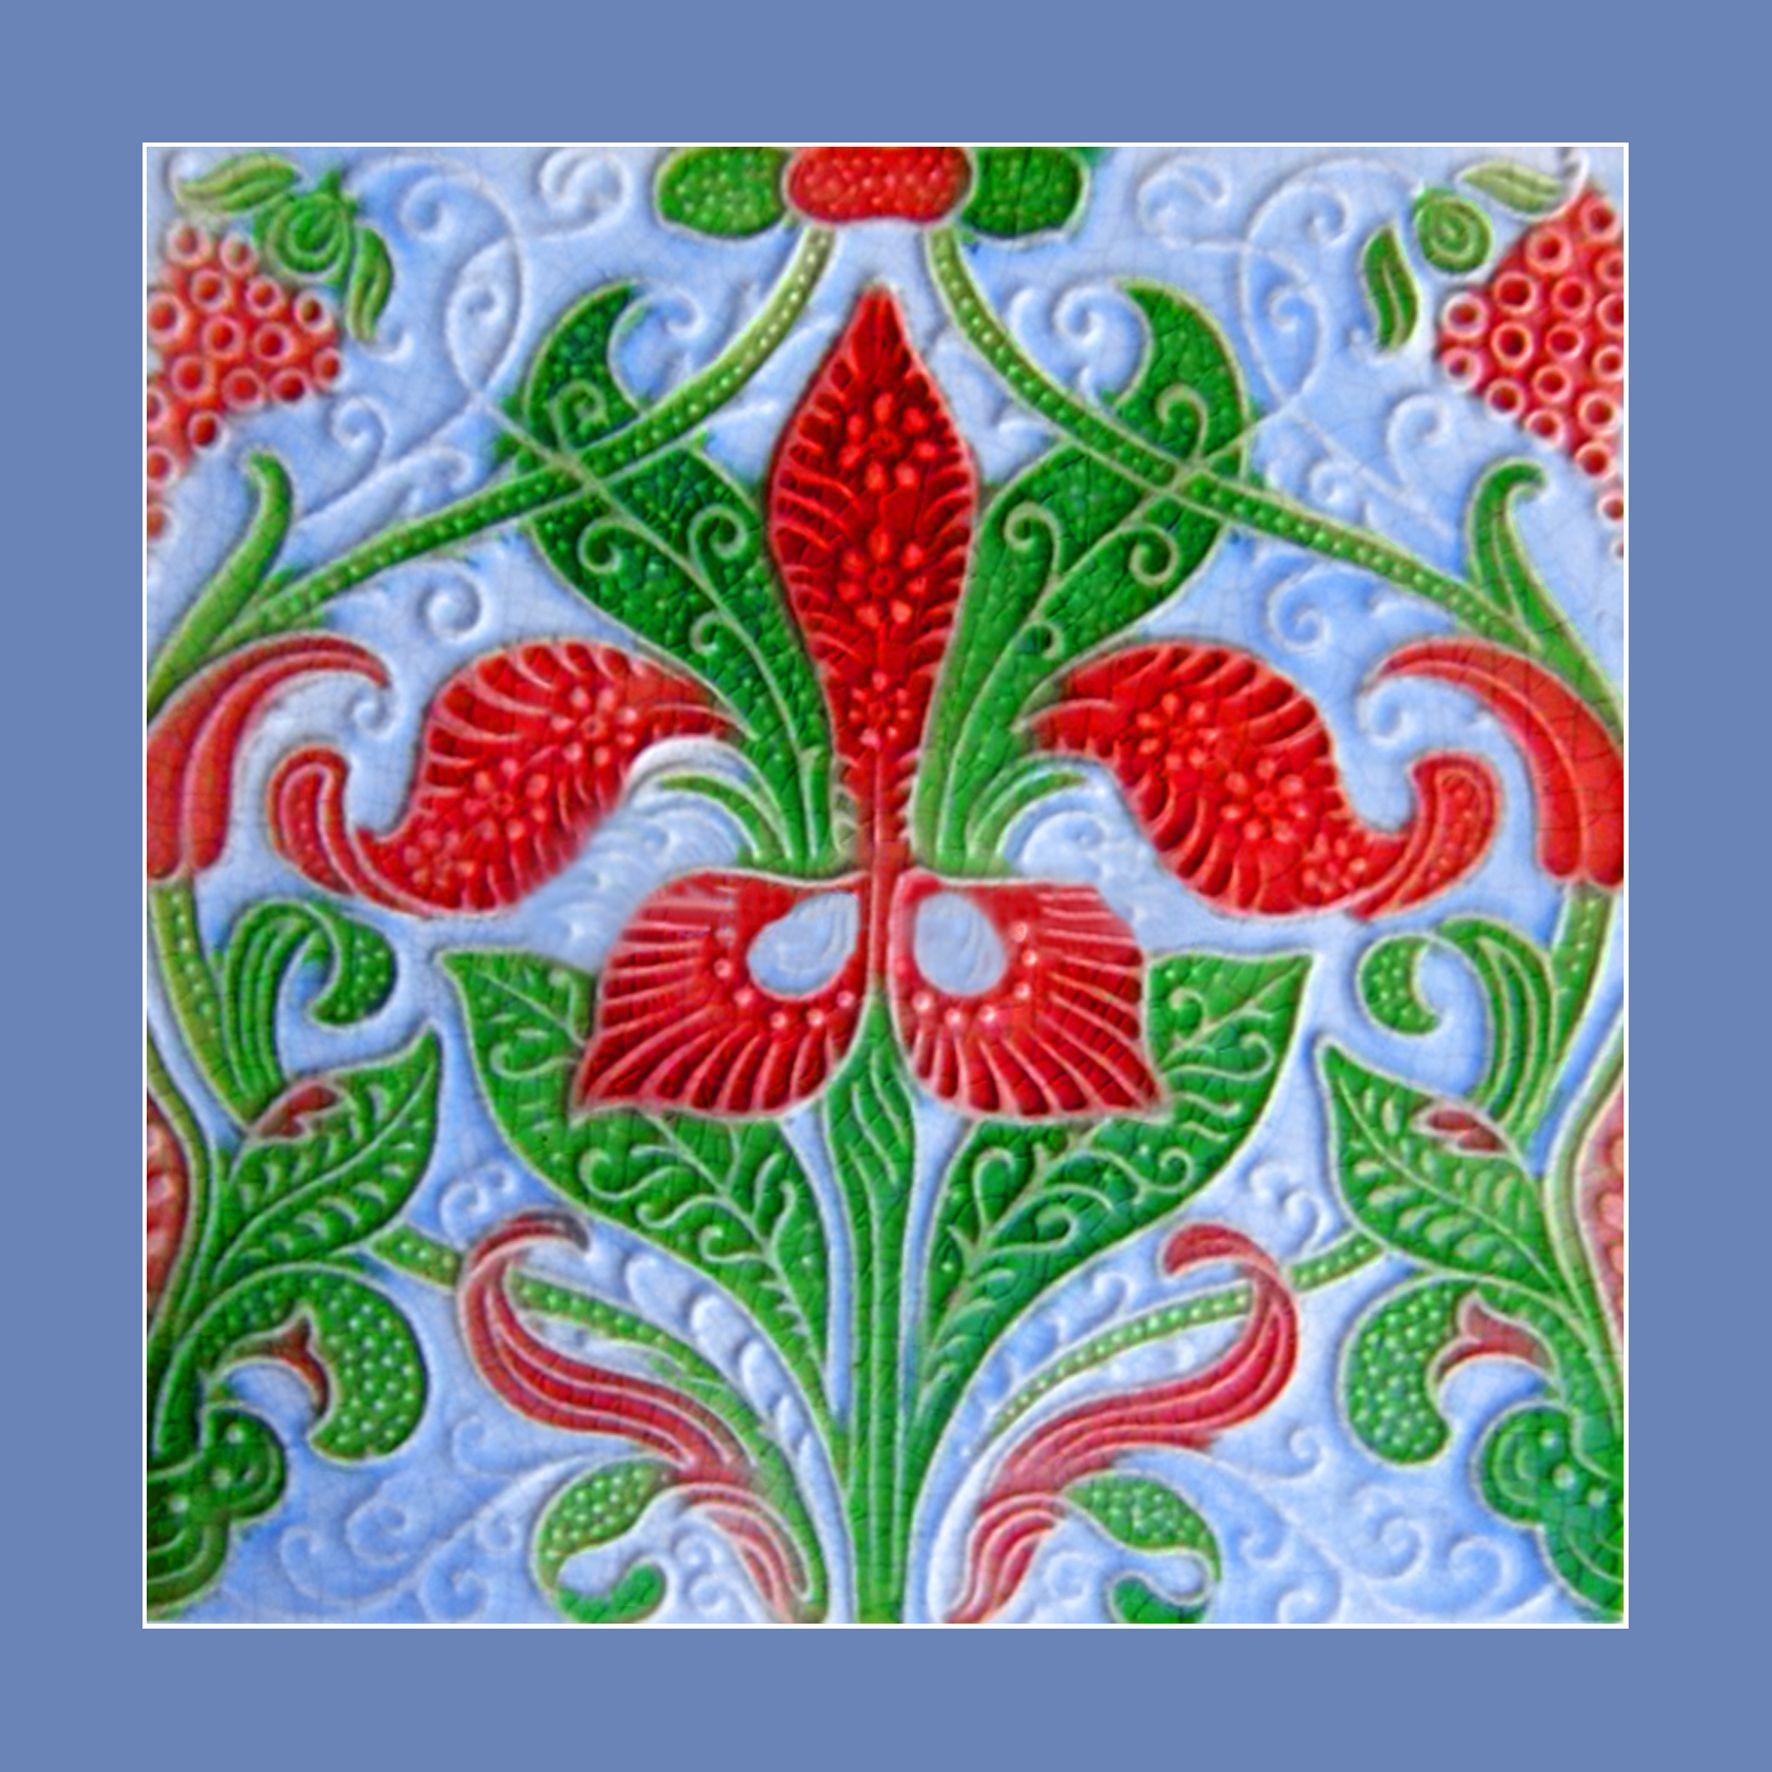 Generous 12X24 Ceramic Tile Thin 18 Inch Ceramic Tile Square 2 X 6 Subway Tile 2 X 8 Glass Subway Tile Old 24 X 48 Drop Ceiling Tiles Pink3X6 Ceramic Subway Tile 16 Ceramic Tile Design By Lewis Day For Pilkington. Buy As An E Card ..